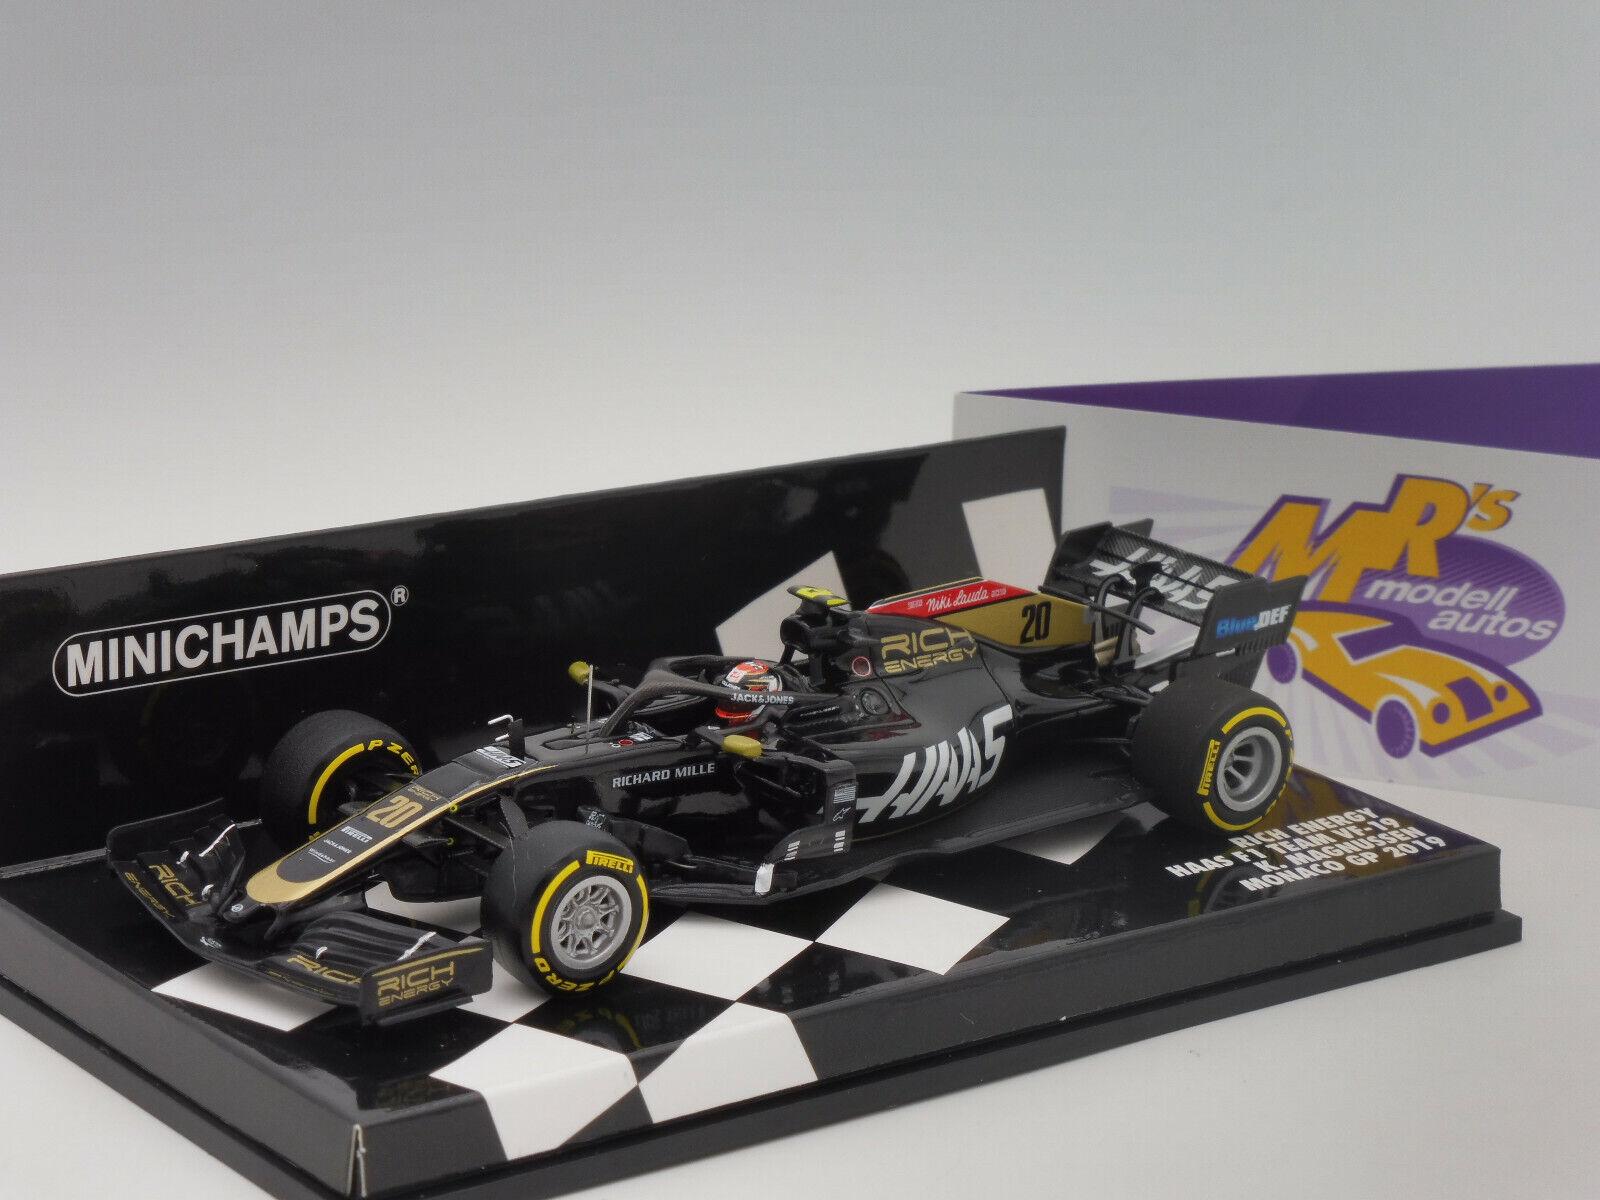 Minichamps 417190620   Rich Energy Haas Haas F1 Monaco GP 2019   K. Magnussen   1 43